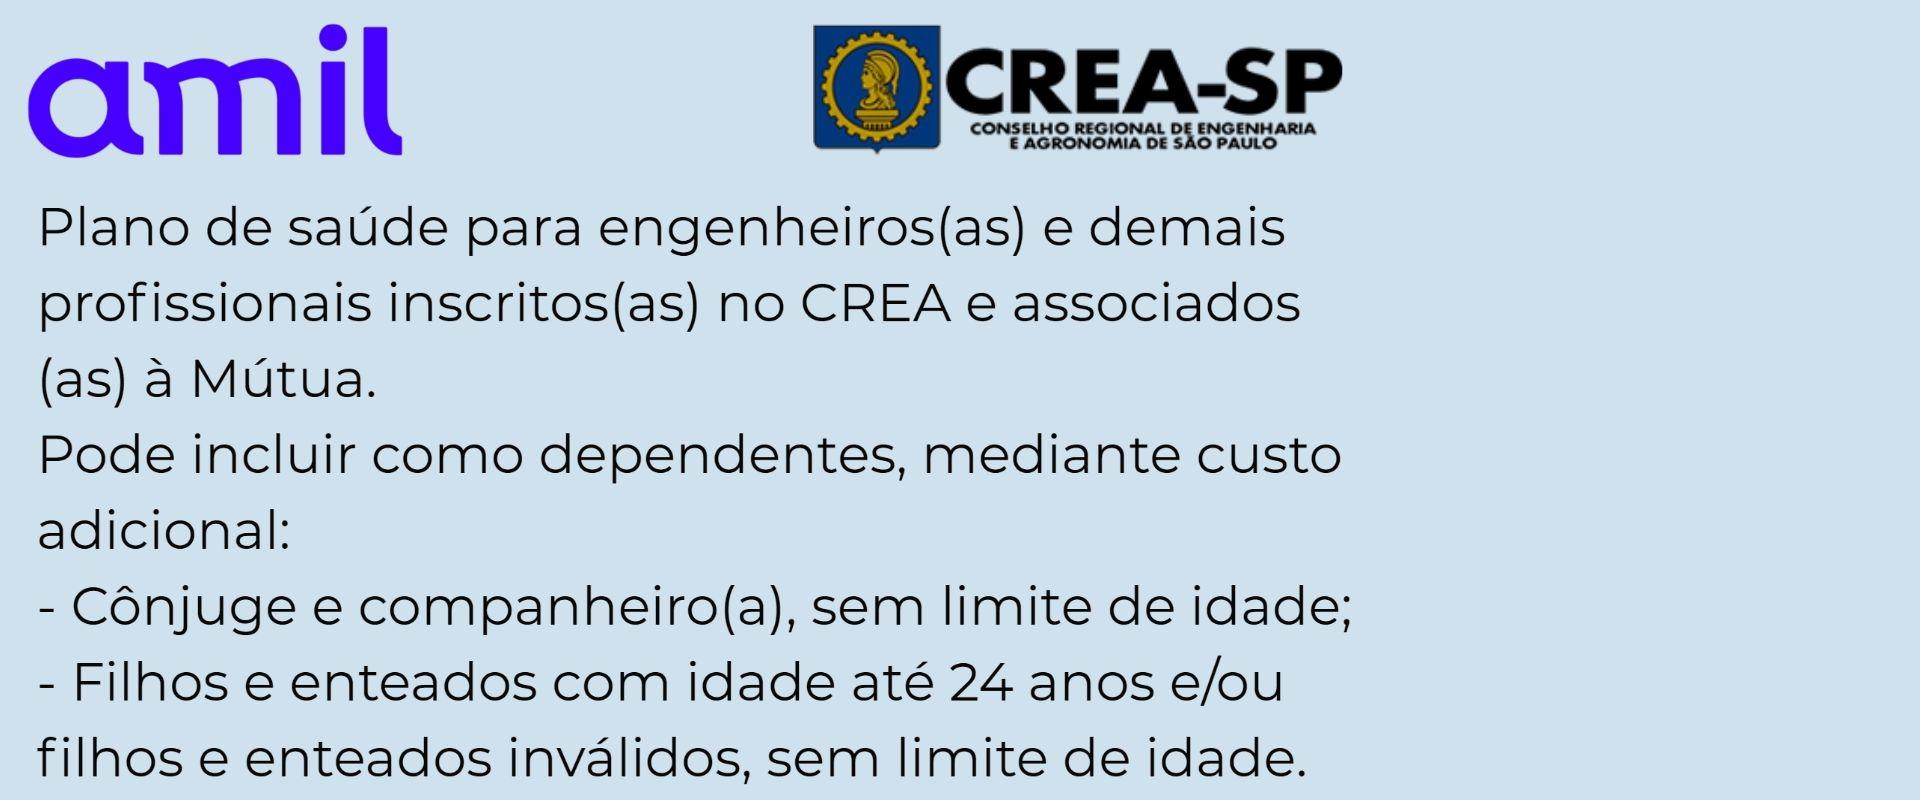 Amil CREA-SP